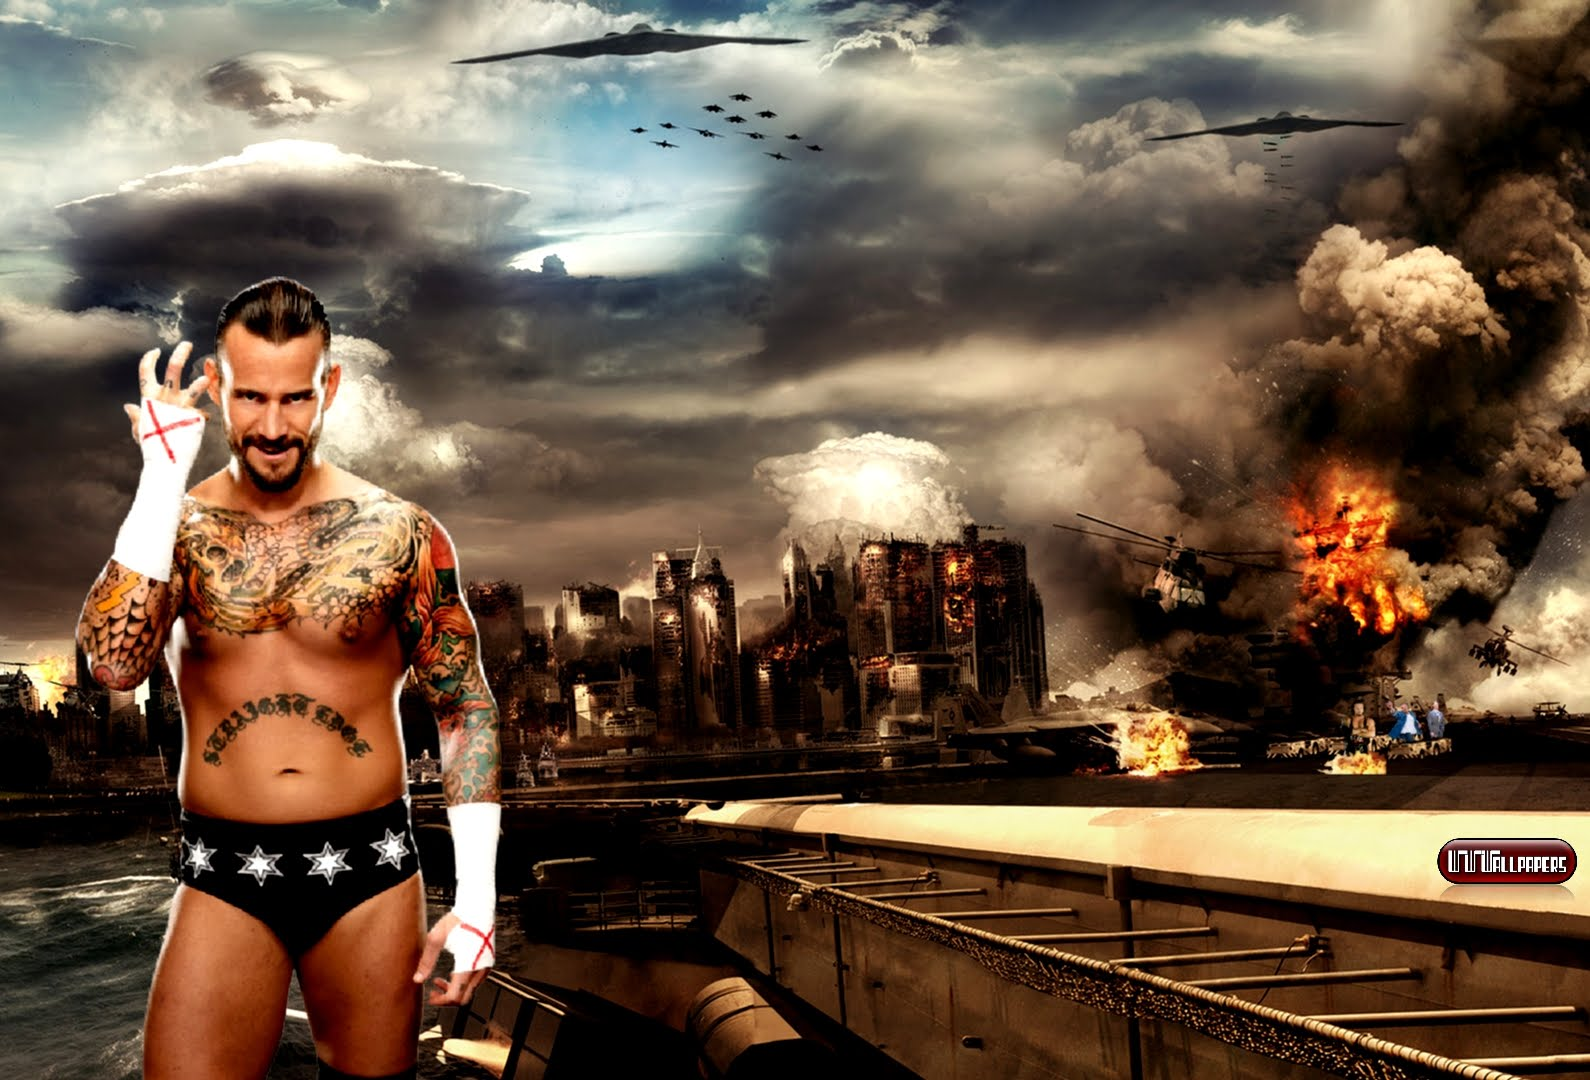 cm punk new 2012 wallpapers wrestling stars